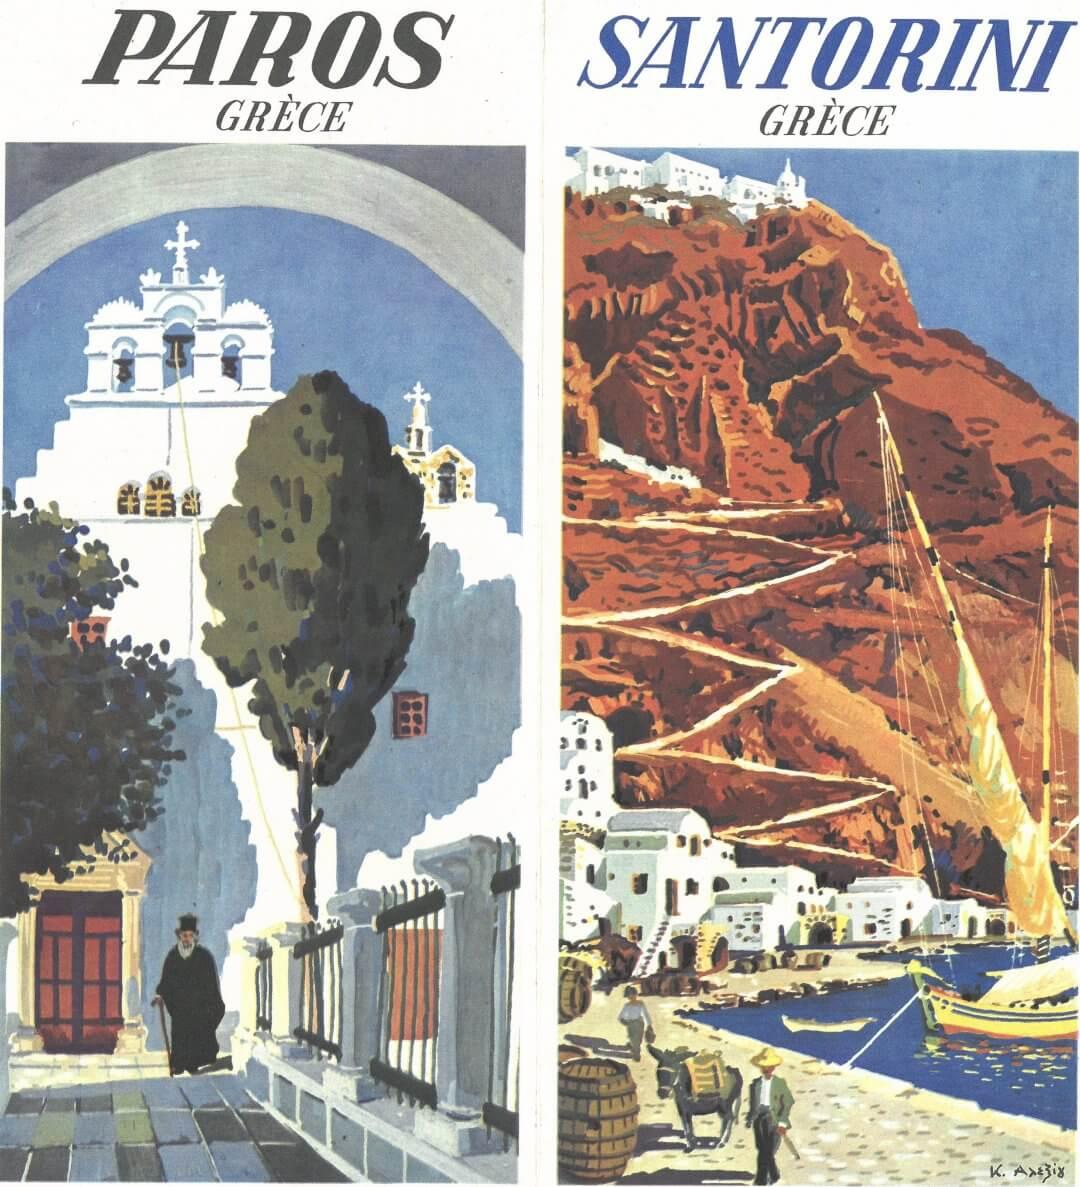 Paros Santorini Greece